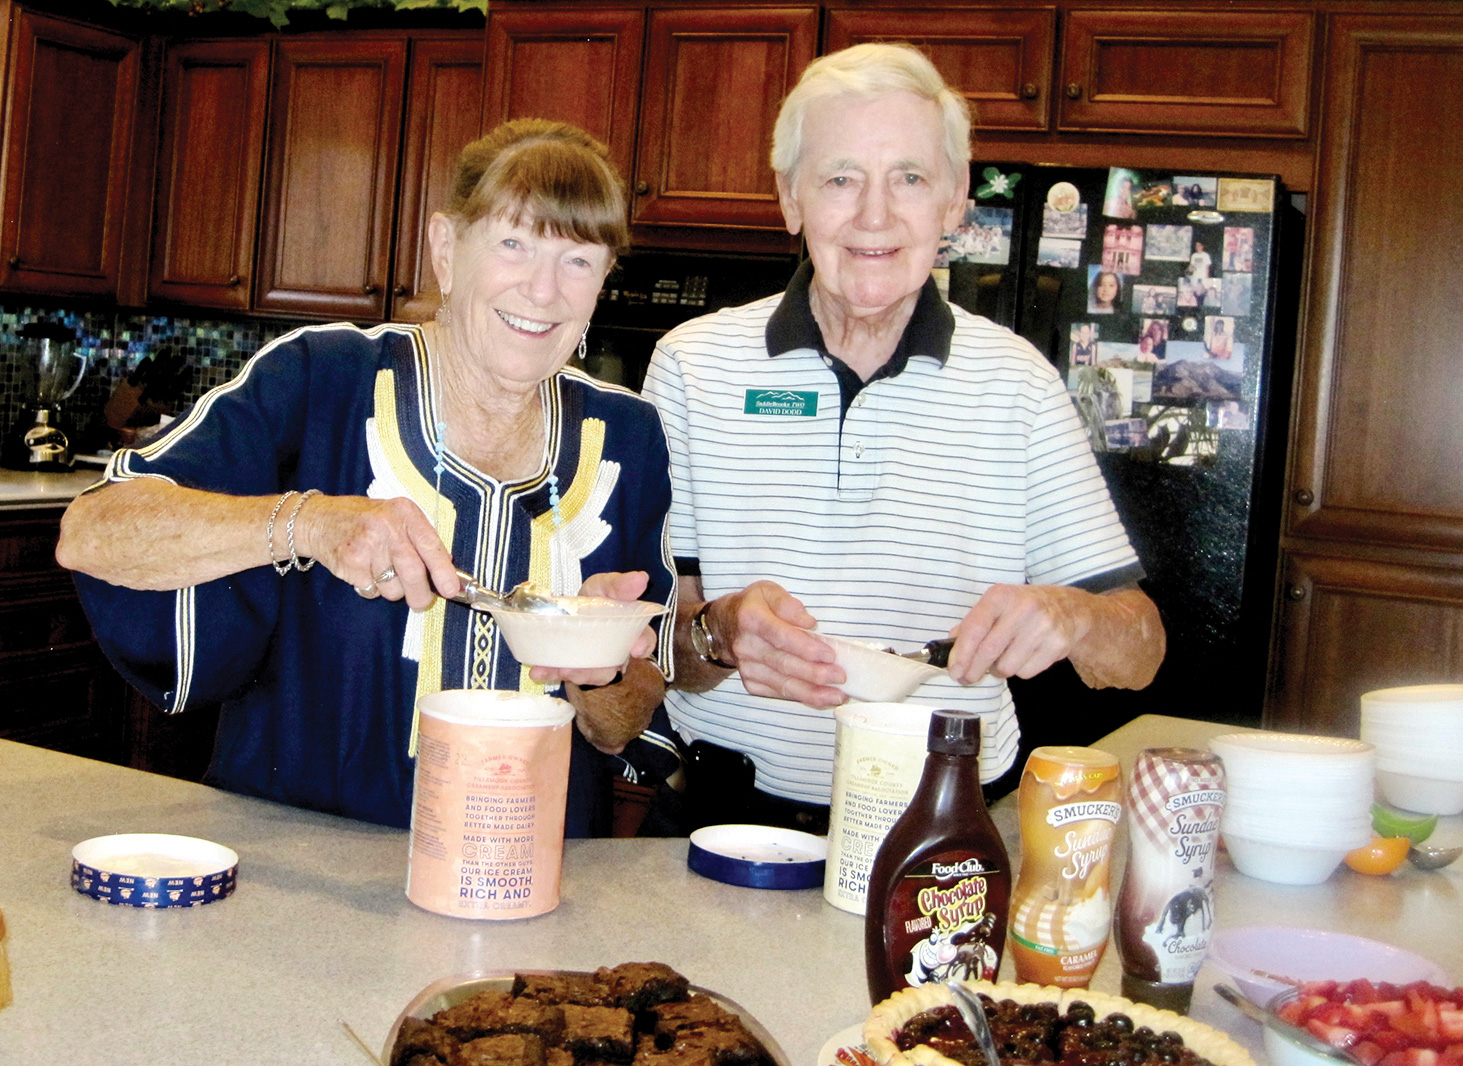 Arlene DesJardins and David Dodd serving up dishes of ice cream